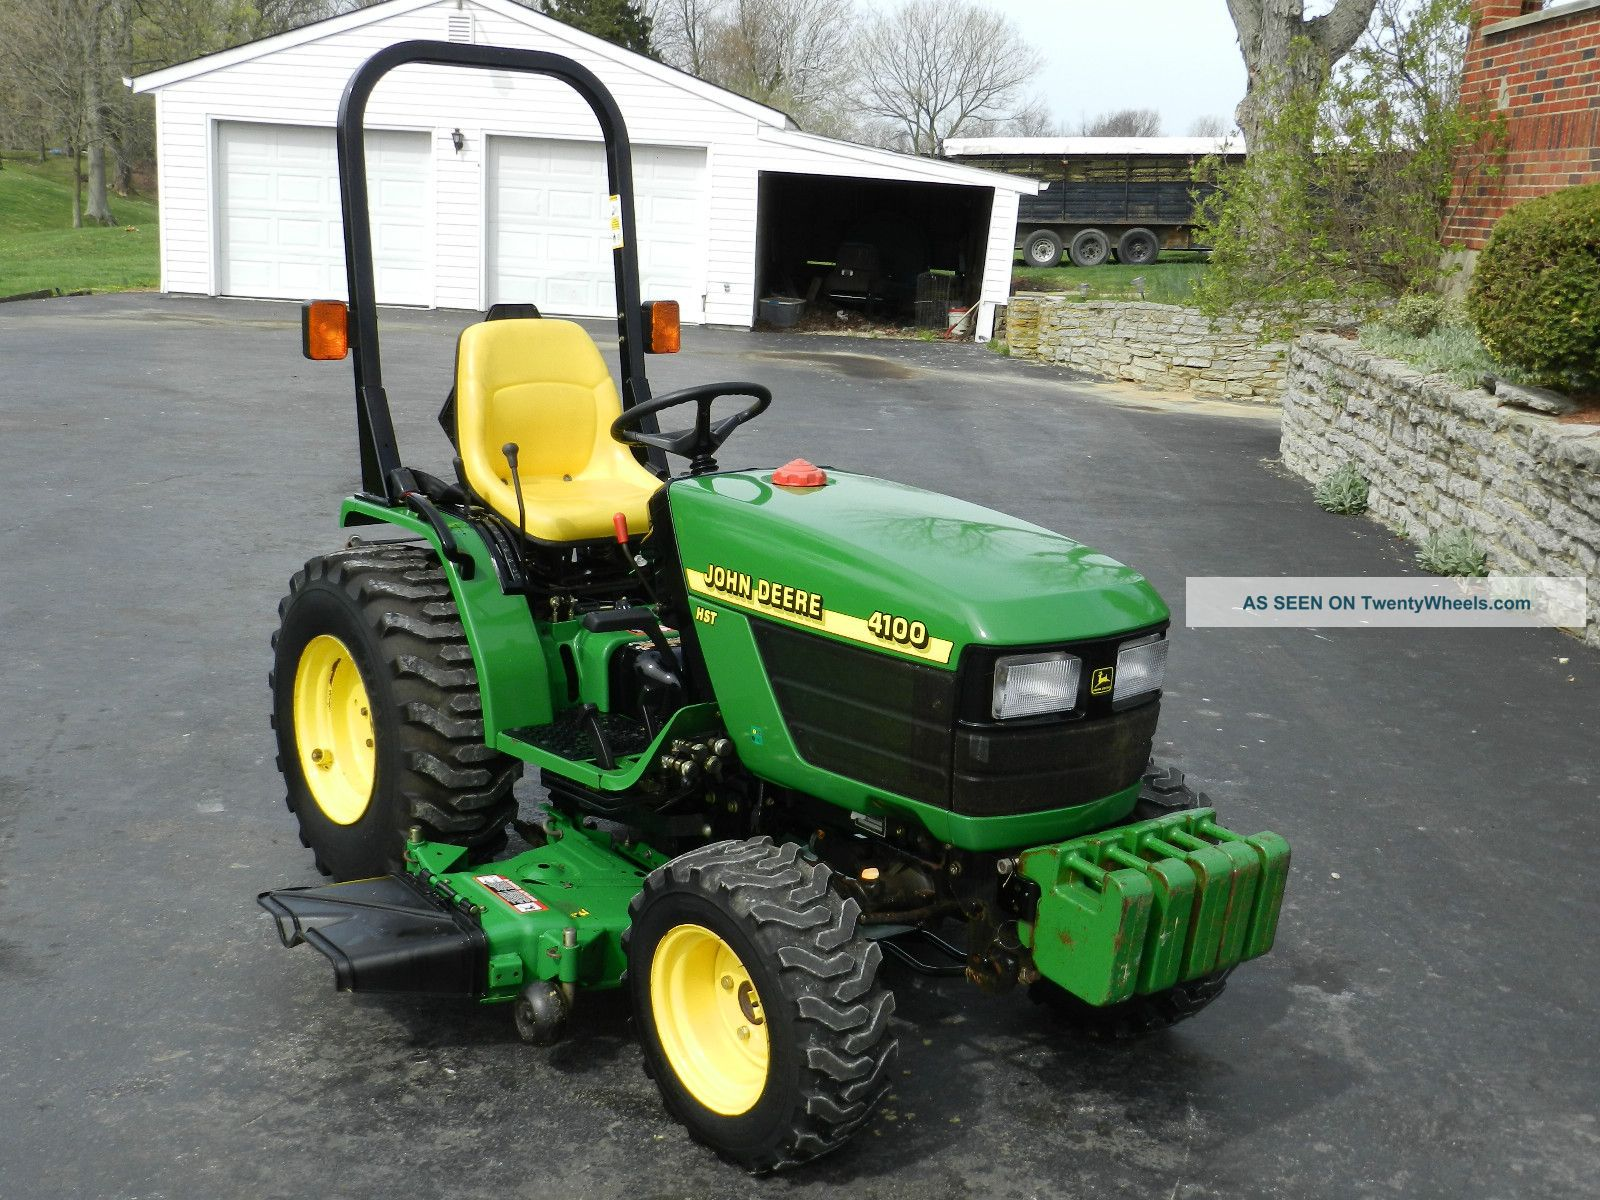 http://twentywheels.com/imgs/a/a/g/x/r/john_deere_4100_compact_tractor__54_in_belly_mower_____4x4___450_hrs_5_lgw.jpg